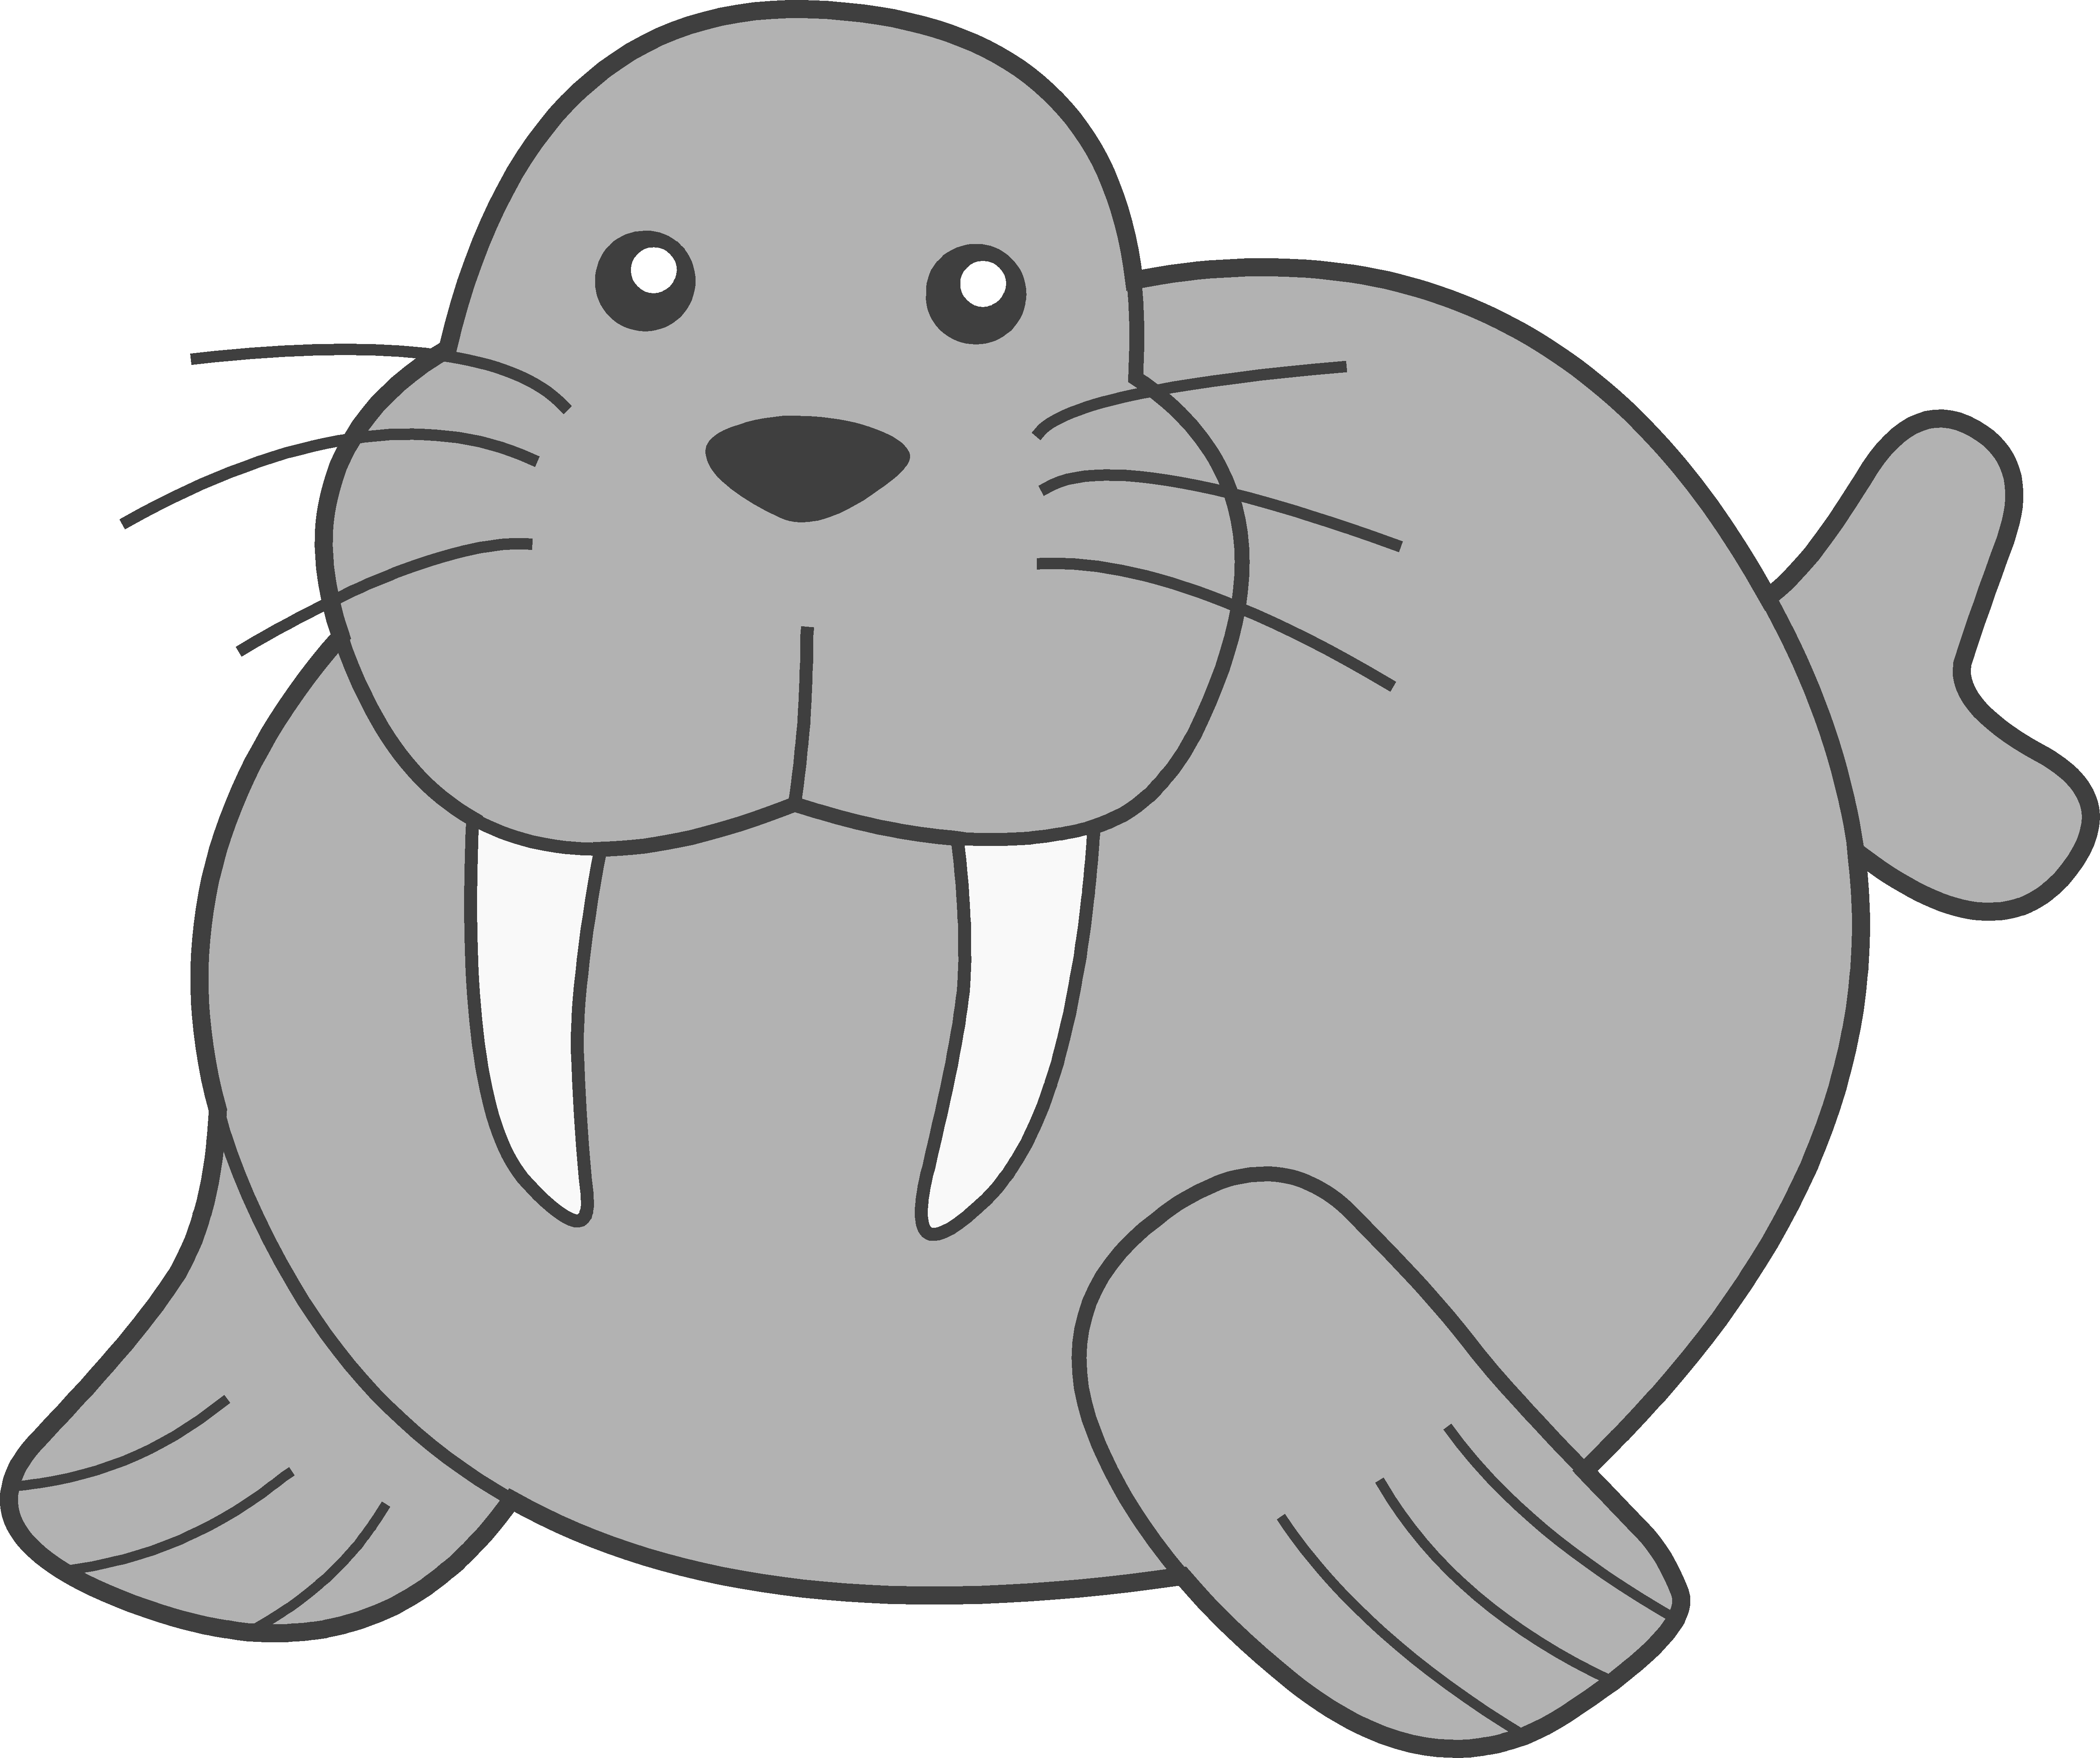 Walrus clipart. Panda free images cute